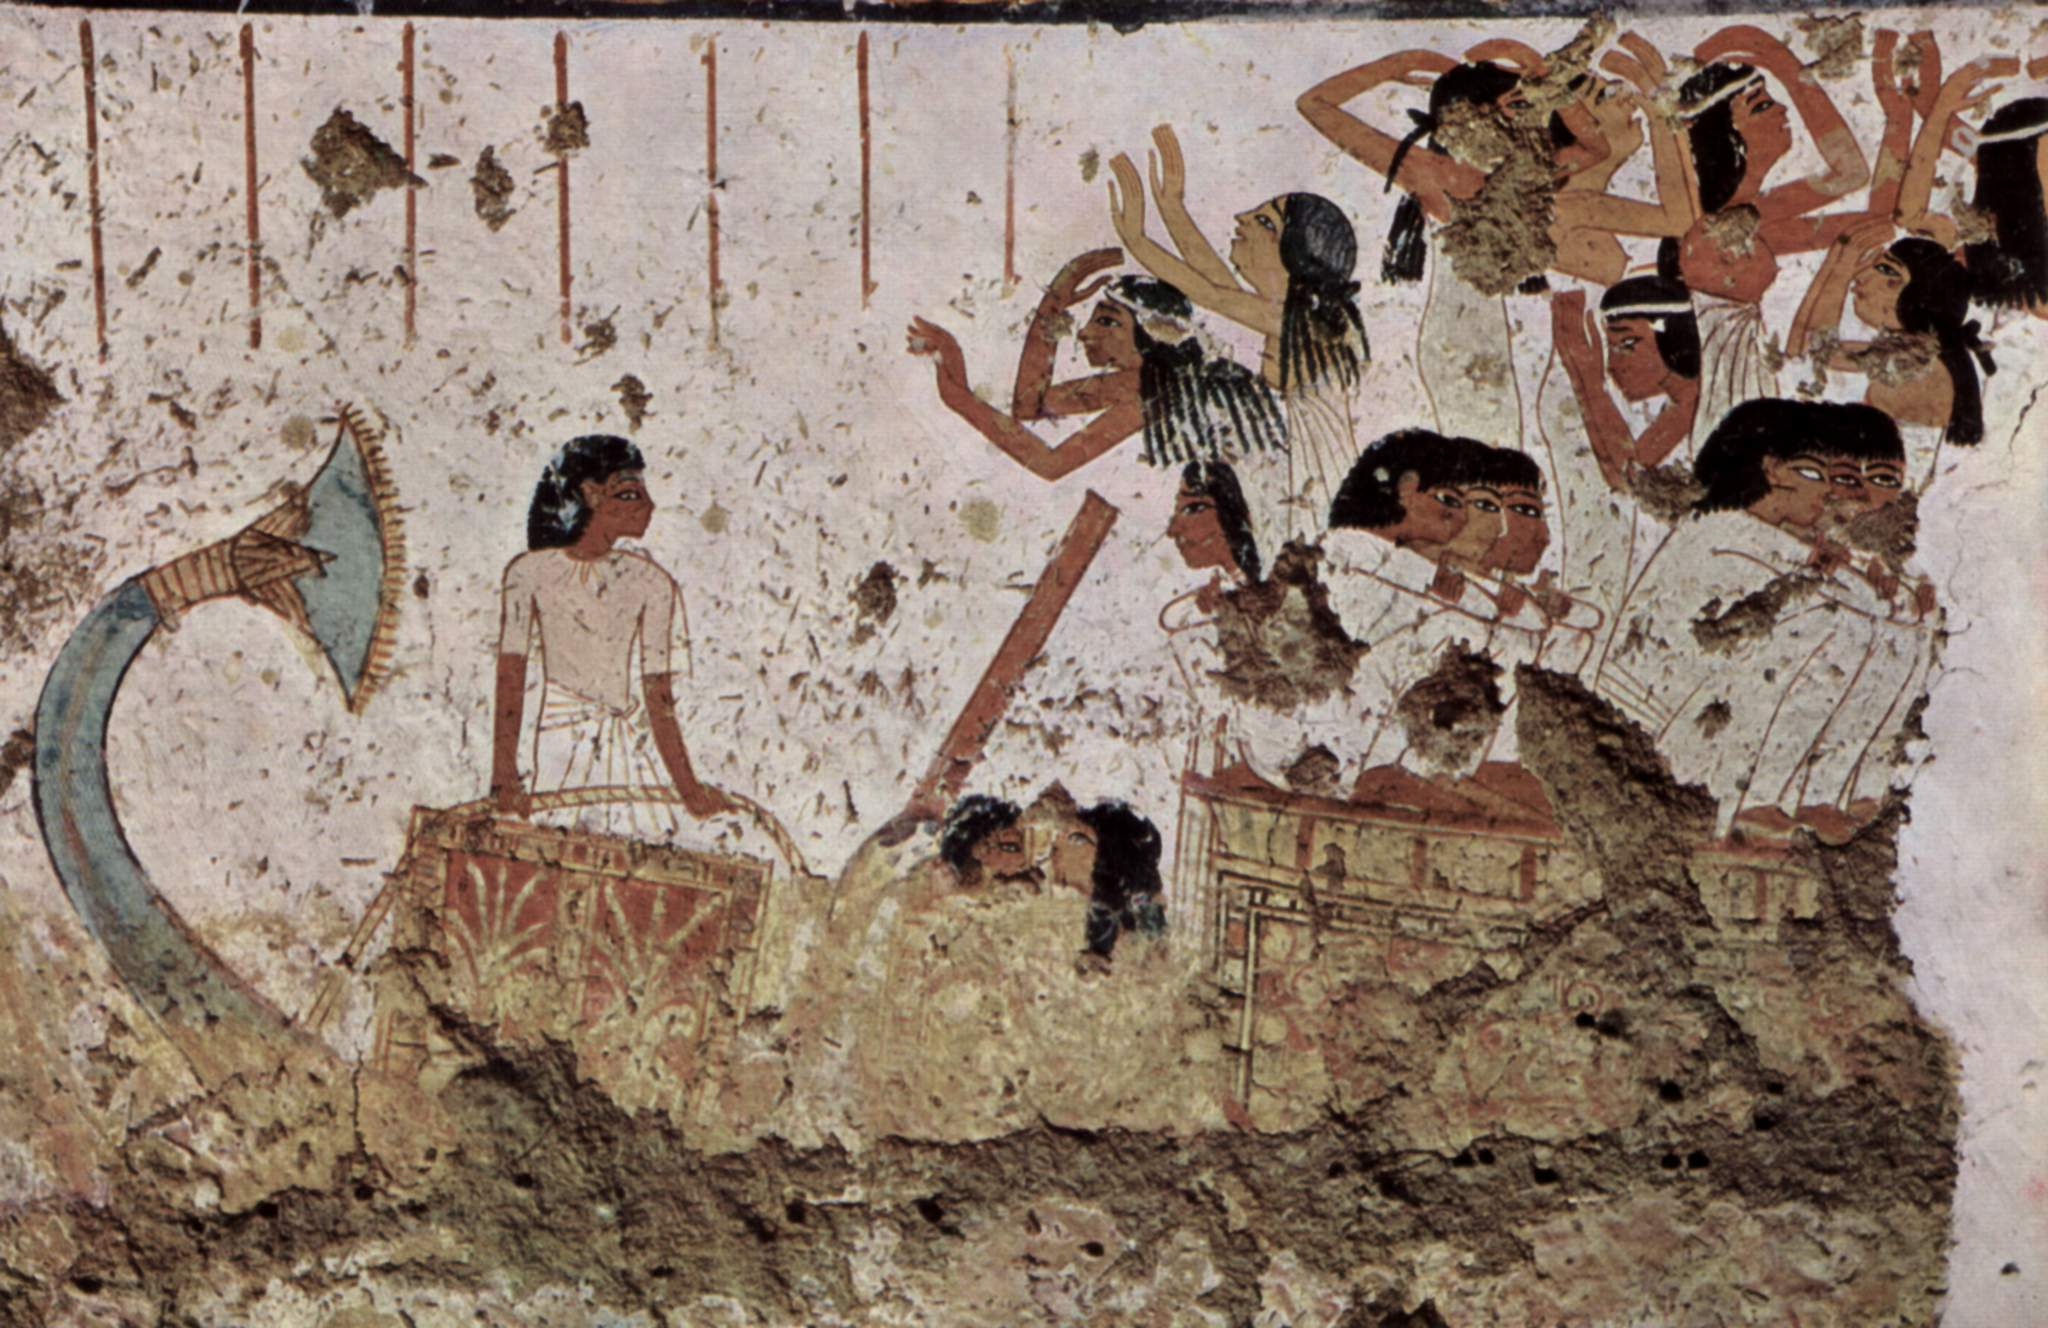 tombe vol mummies ontdekt in egypte archeologie online